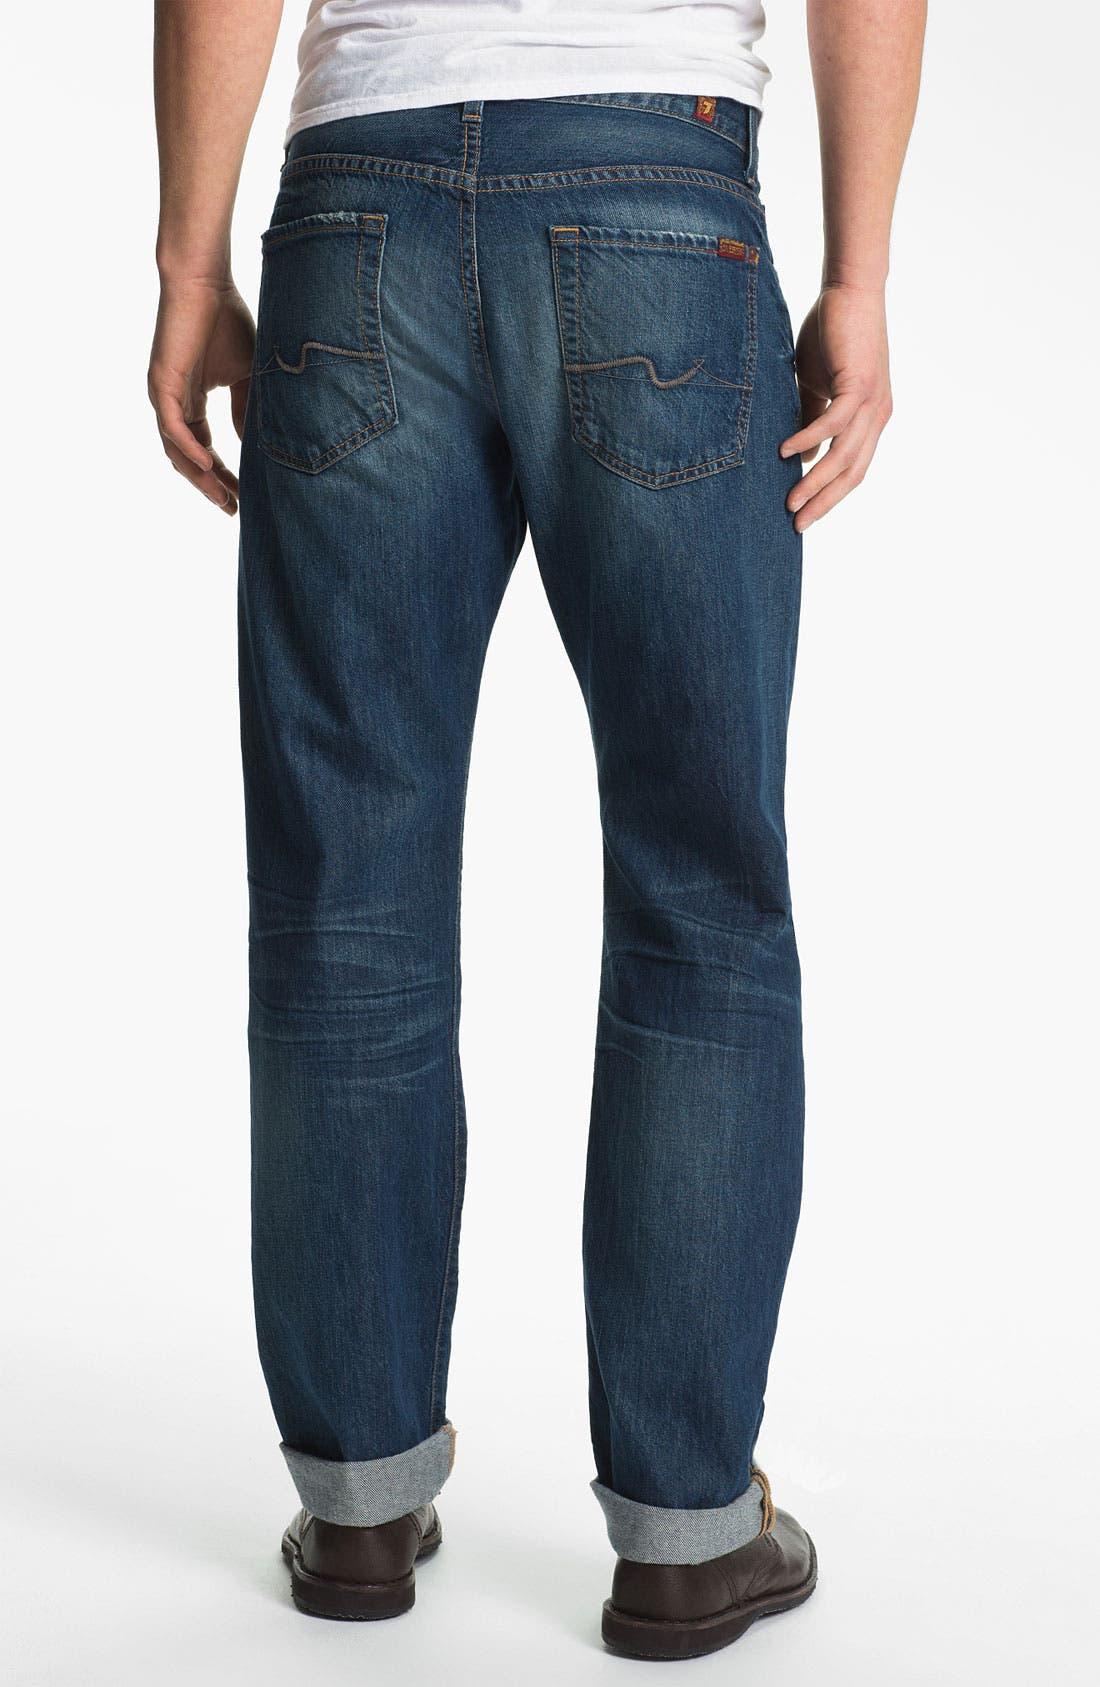 Main Image - 7 For All Mankind® 'Carsen' Straight Leg Jeans (Juniper Bay)